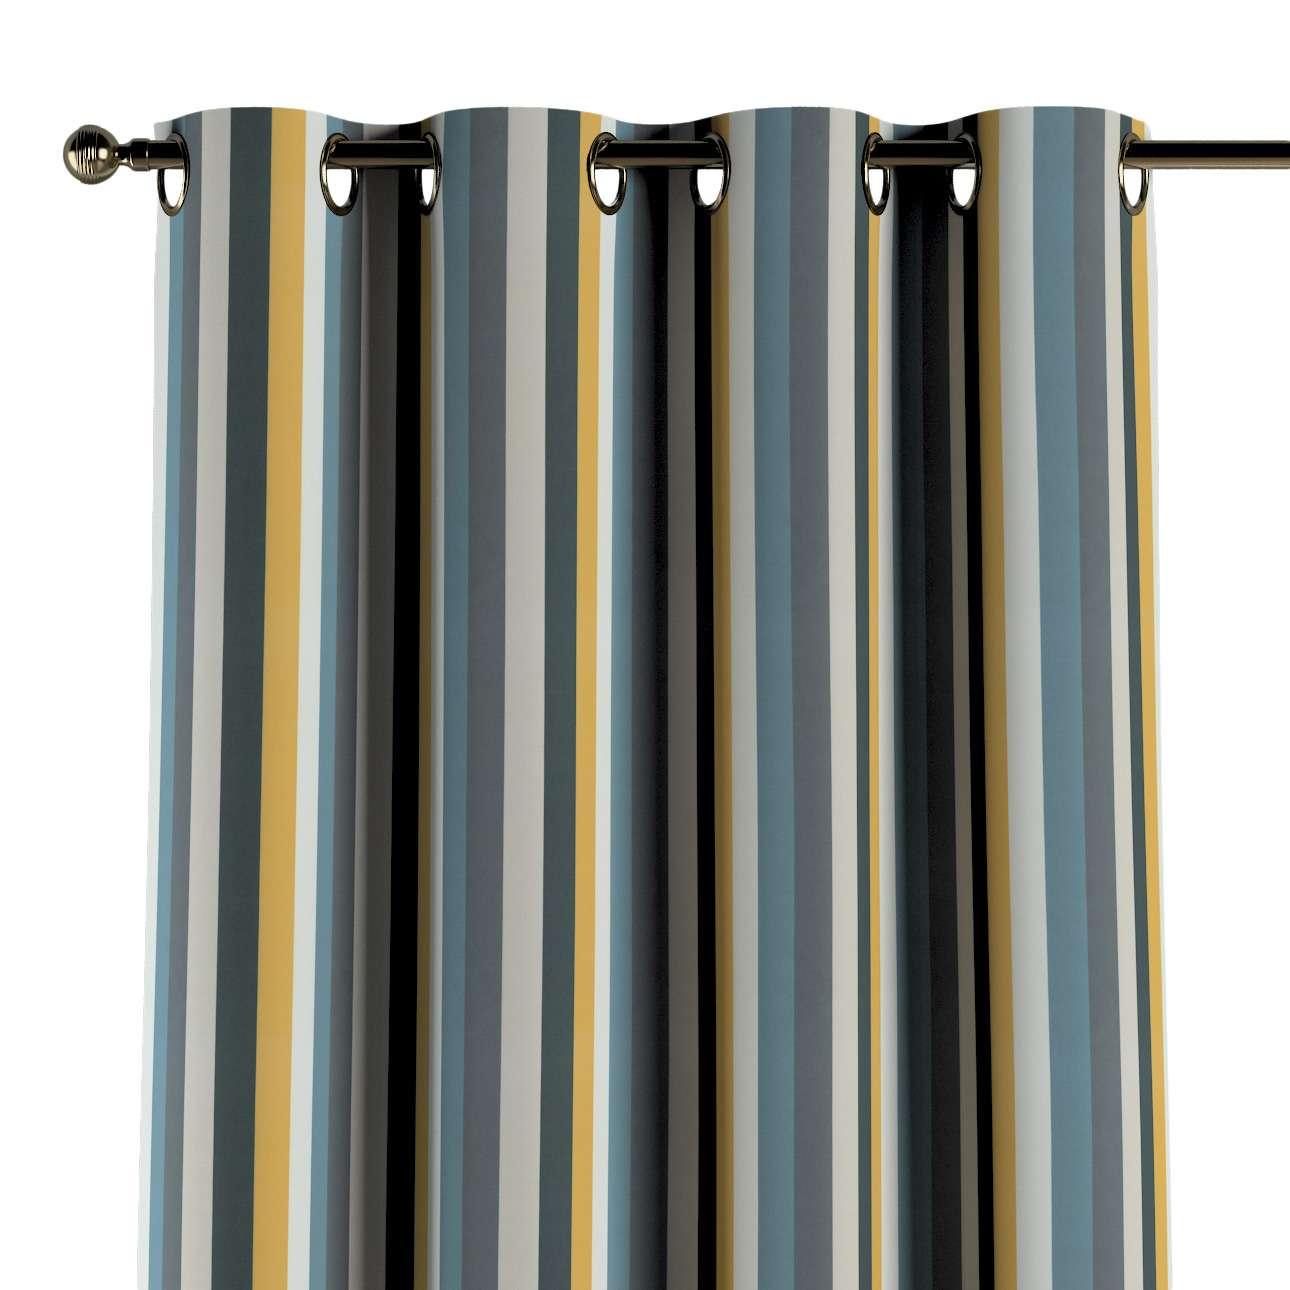 Záves s kolieskami V kolekcii Vintage 70's, tkanina: 143-59